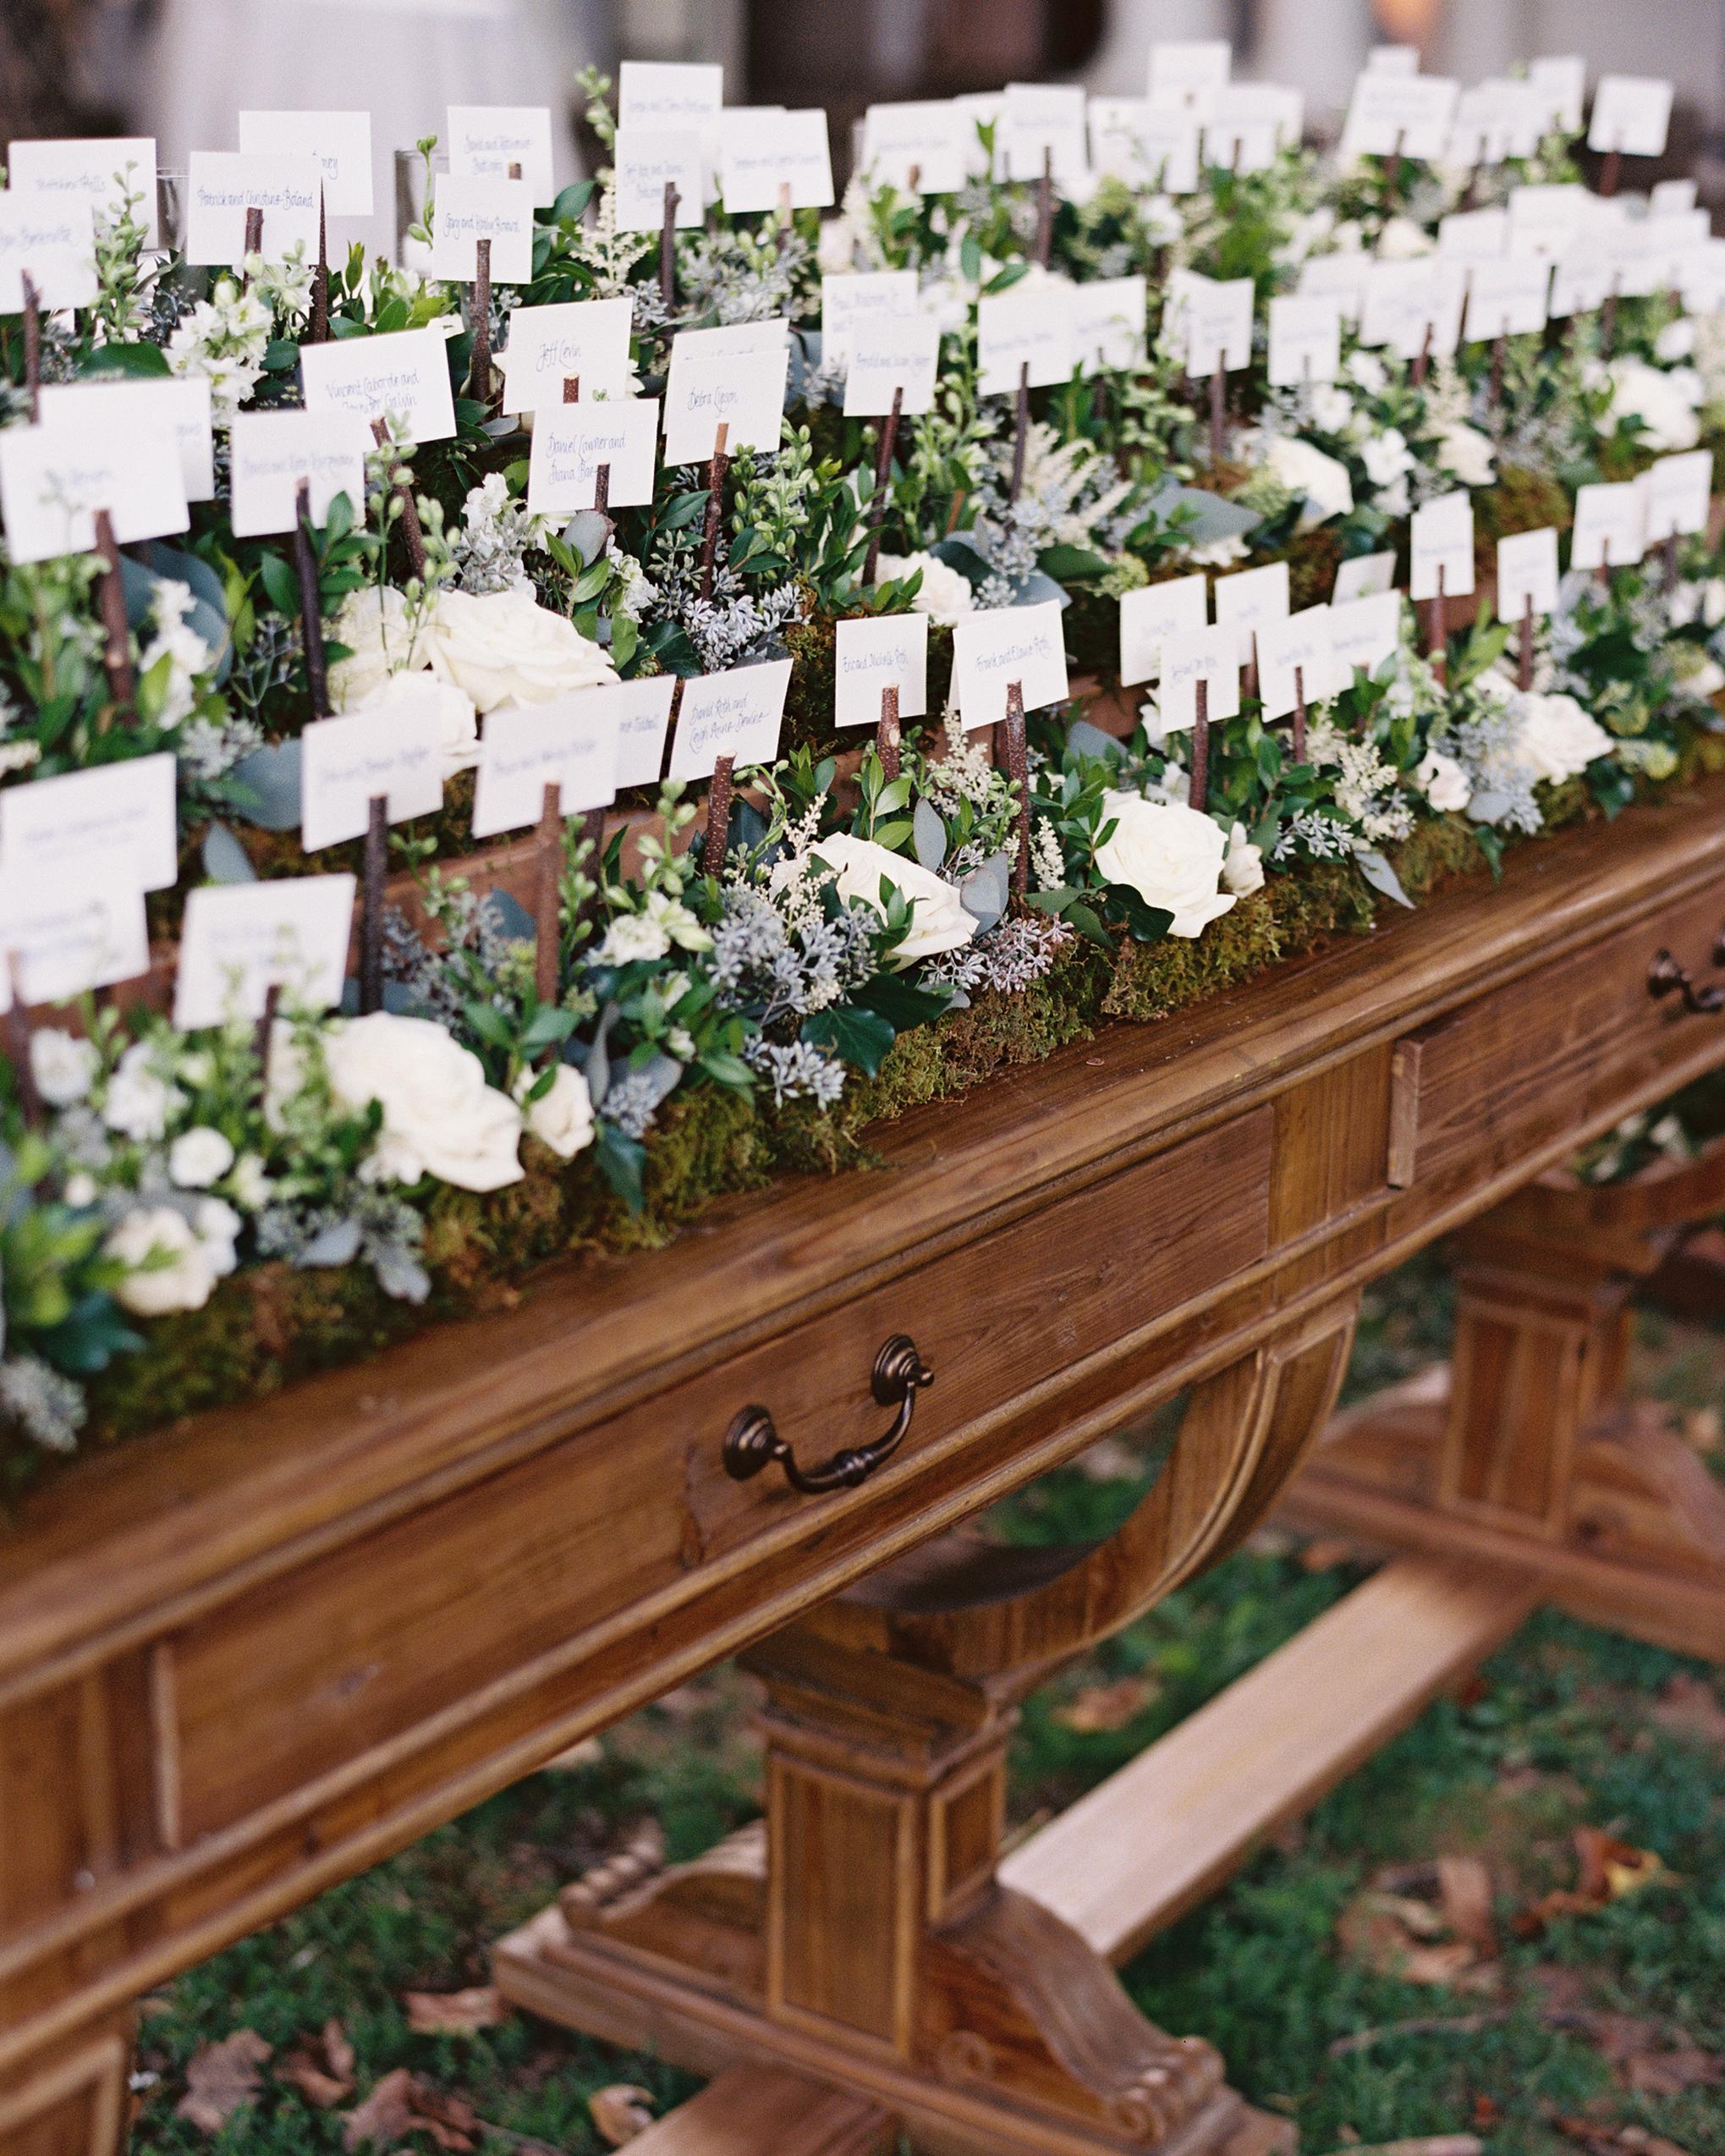 beth-scott-wedding-escortcard-0660-s112077-0715.jpg